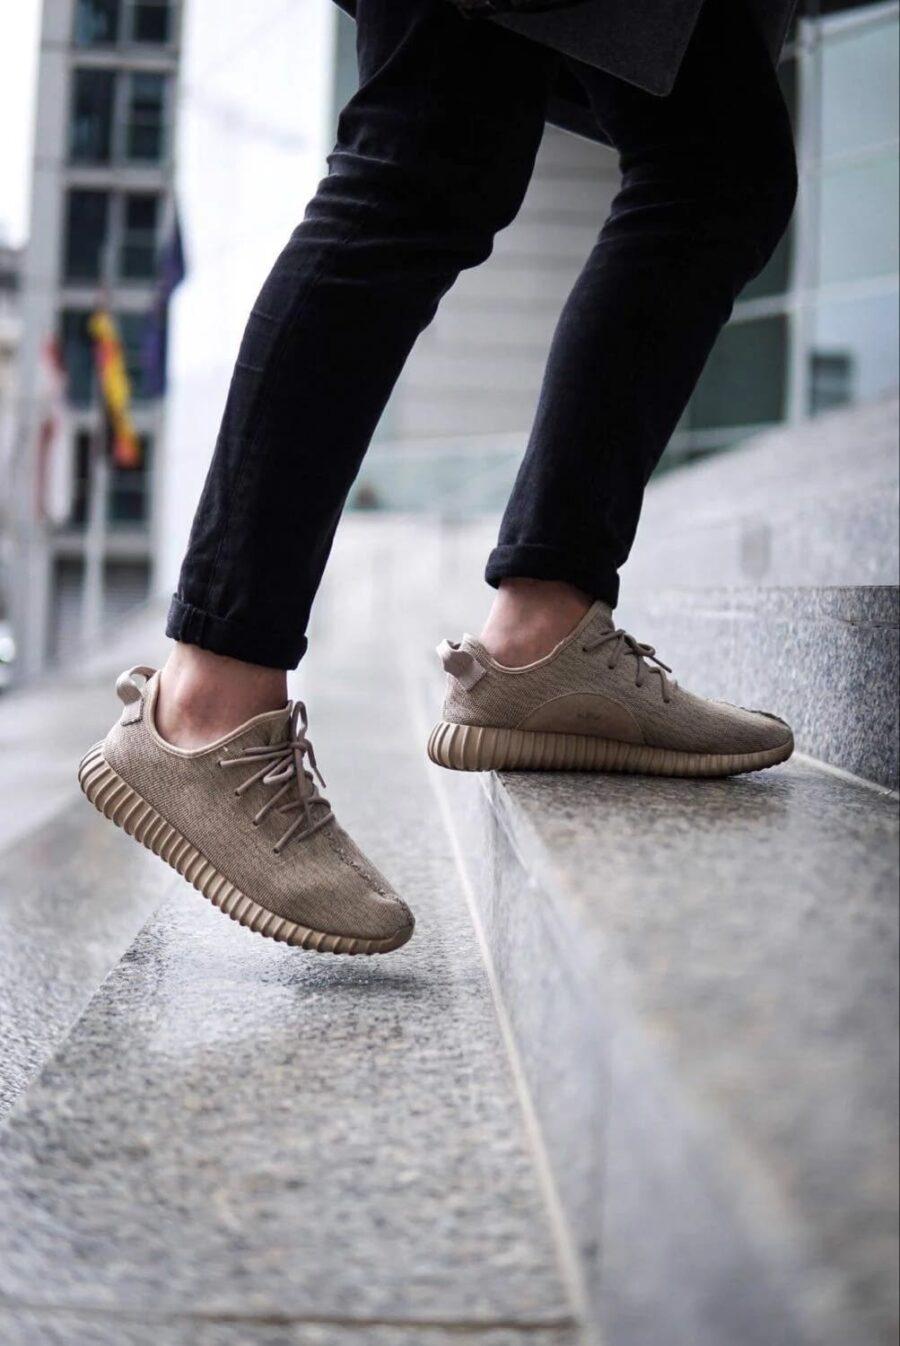 giay-adidas-yeezy-boost-350-oxford-tan-aq2661